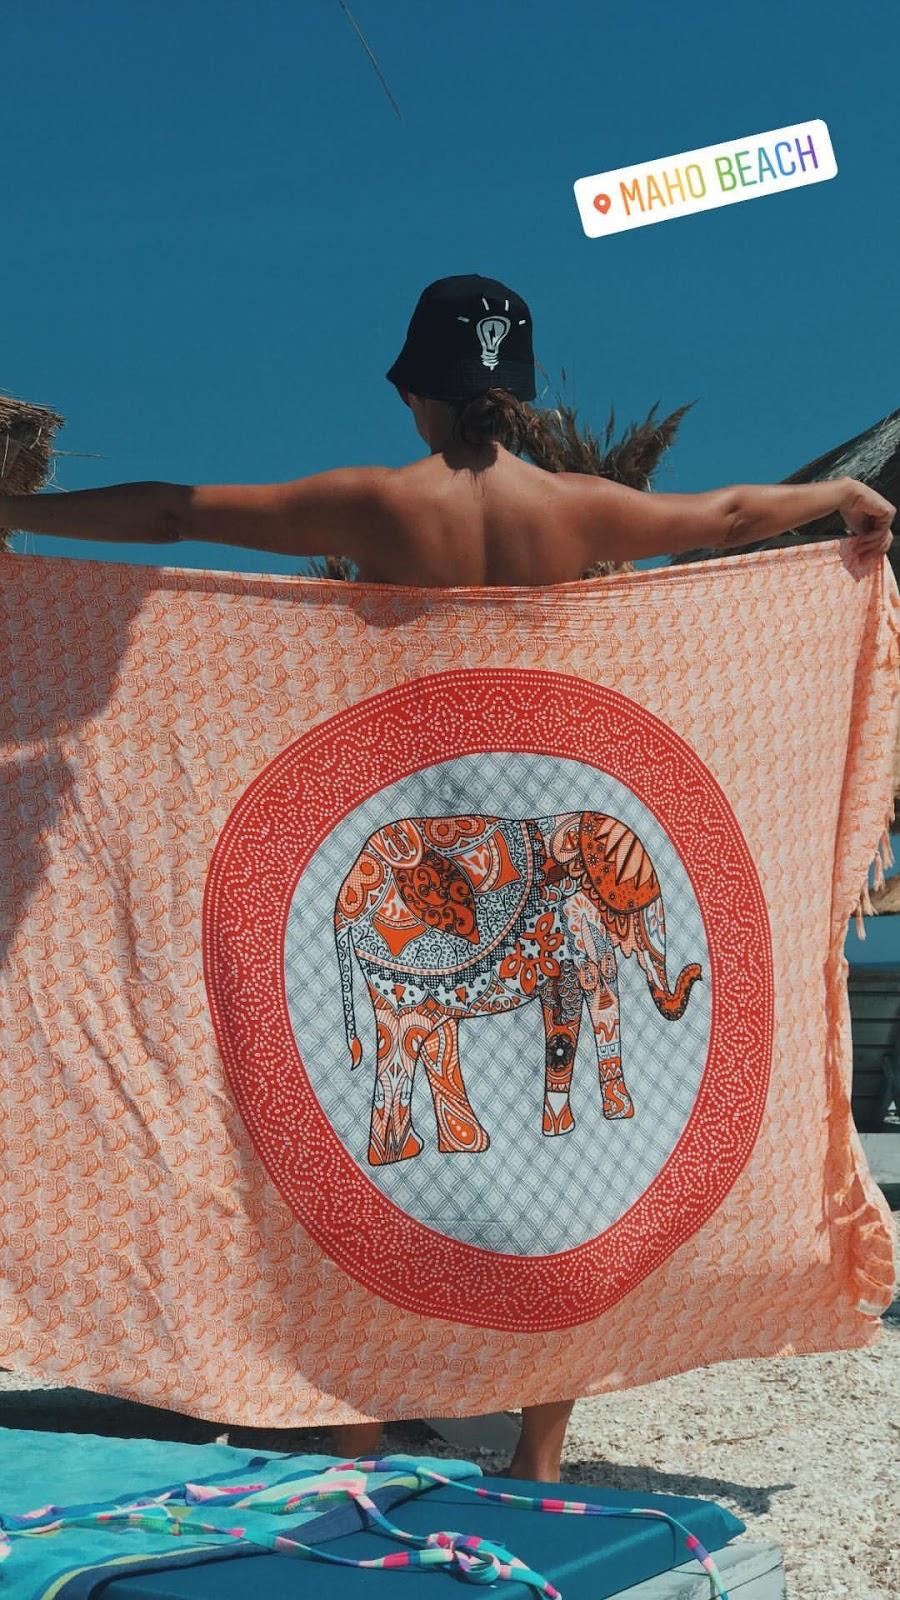 Alexandra Stan topless at Maho beach in the Caribbean 16 June, 2018